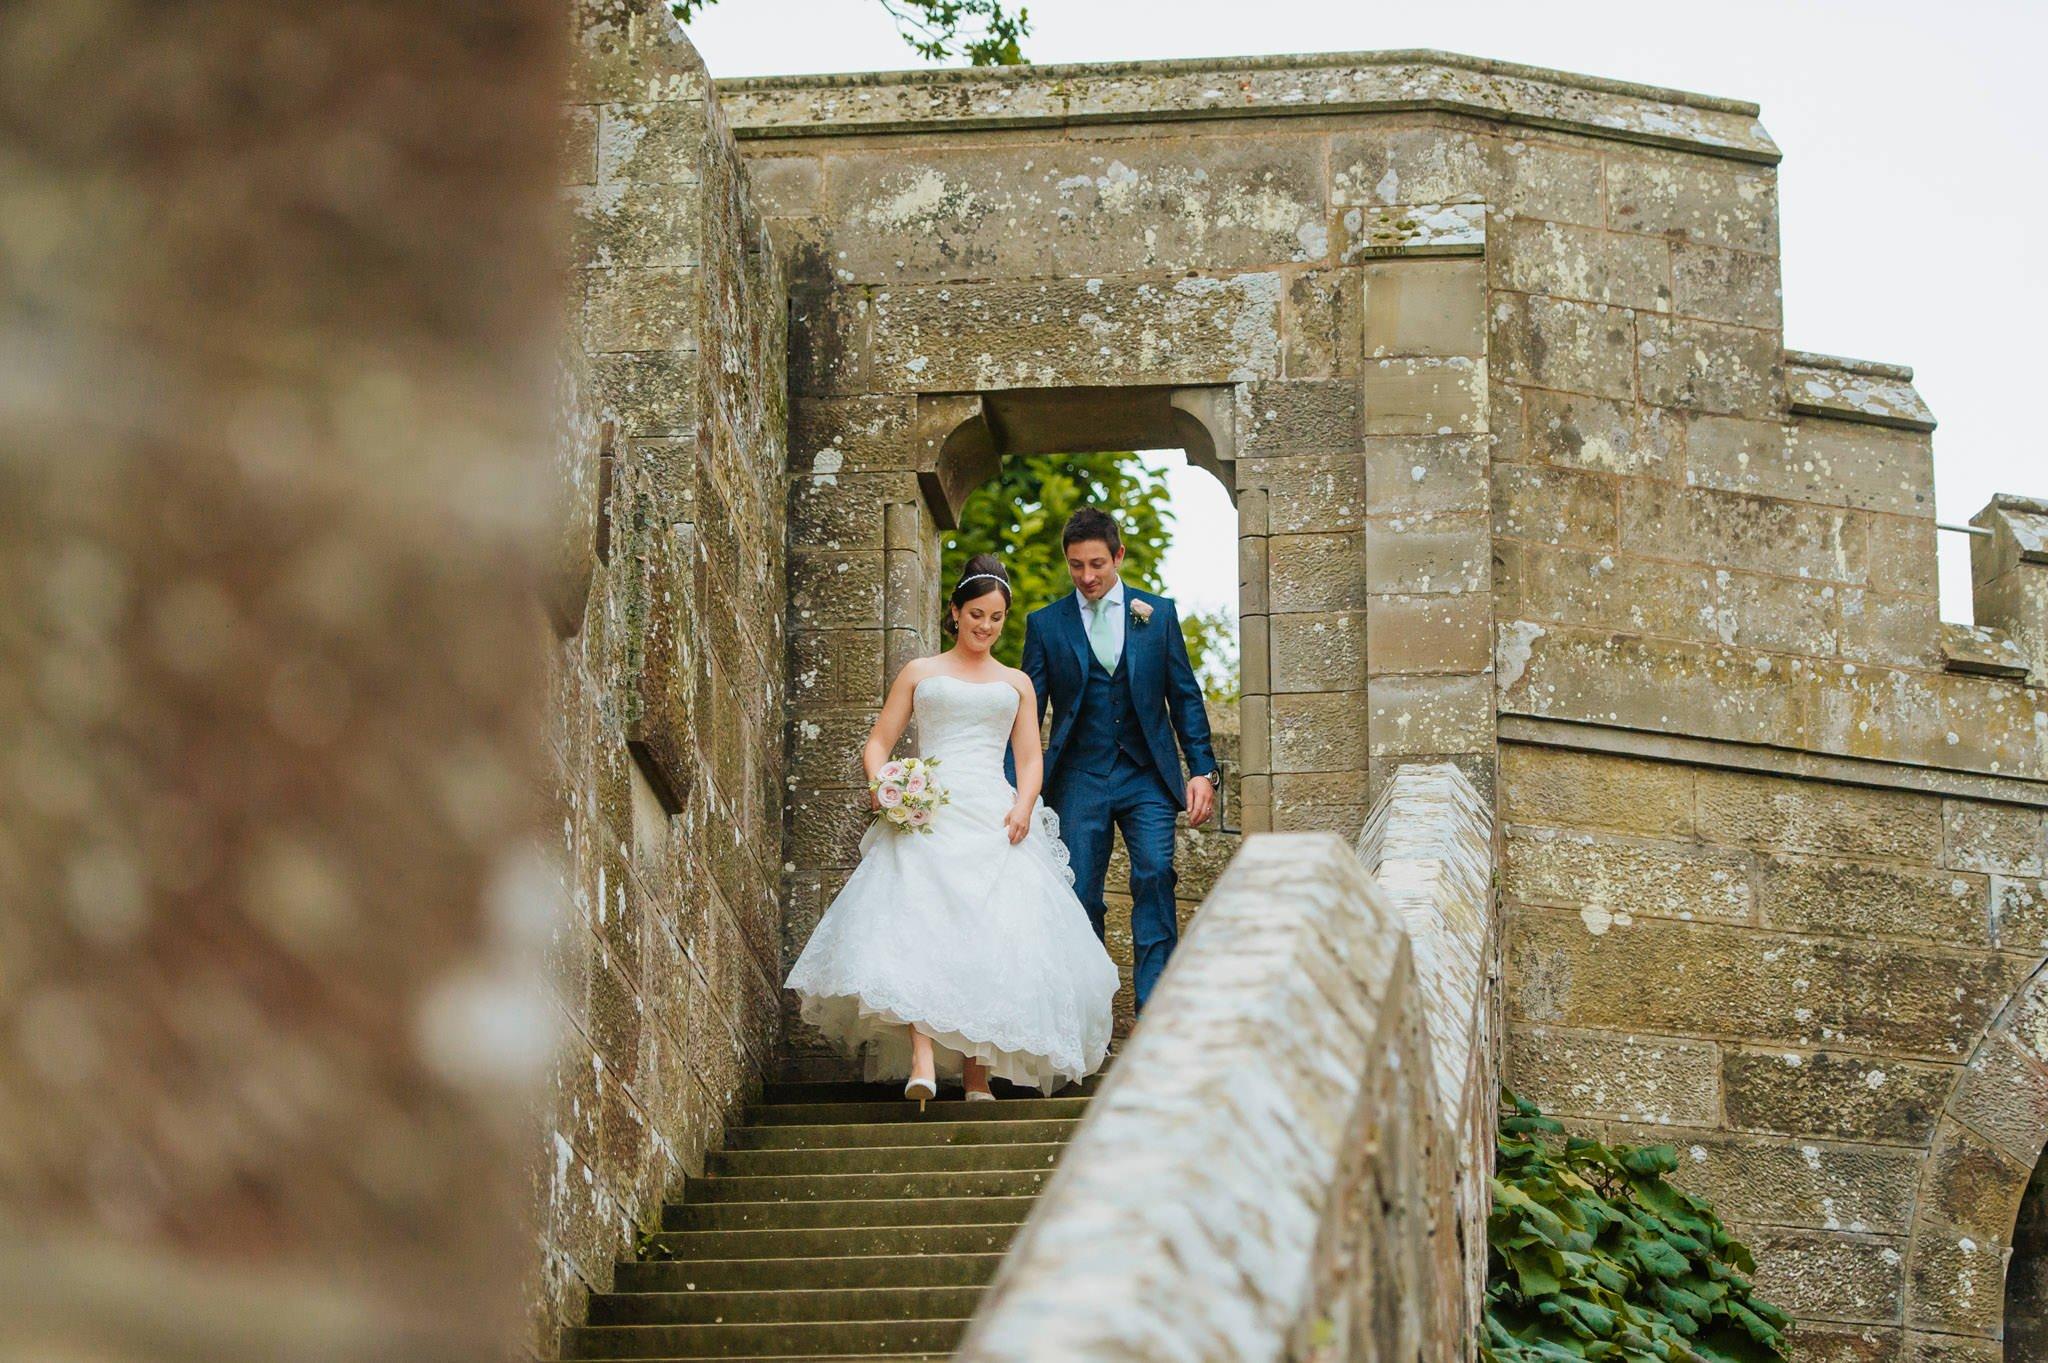 Eastnor Castle wedding photographer Herefordshire, West Midlands - Sarah + Dean 58